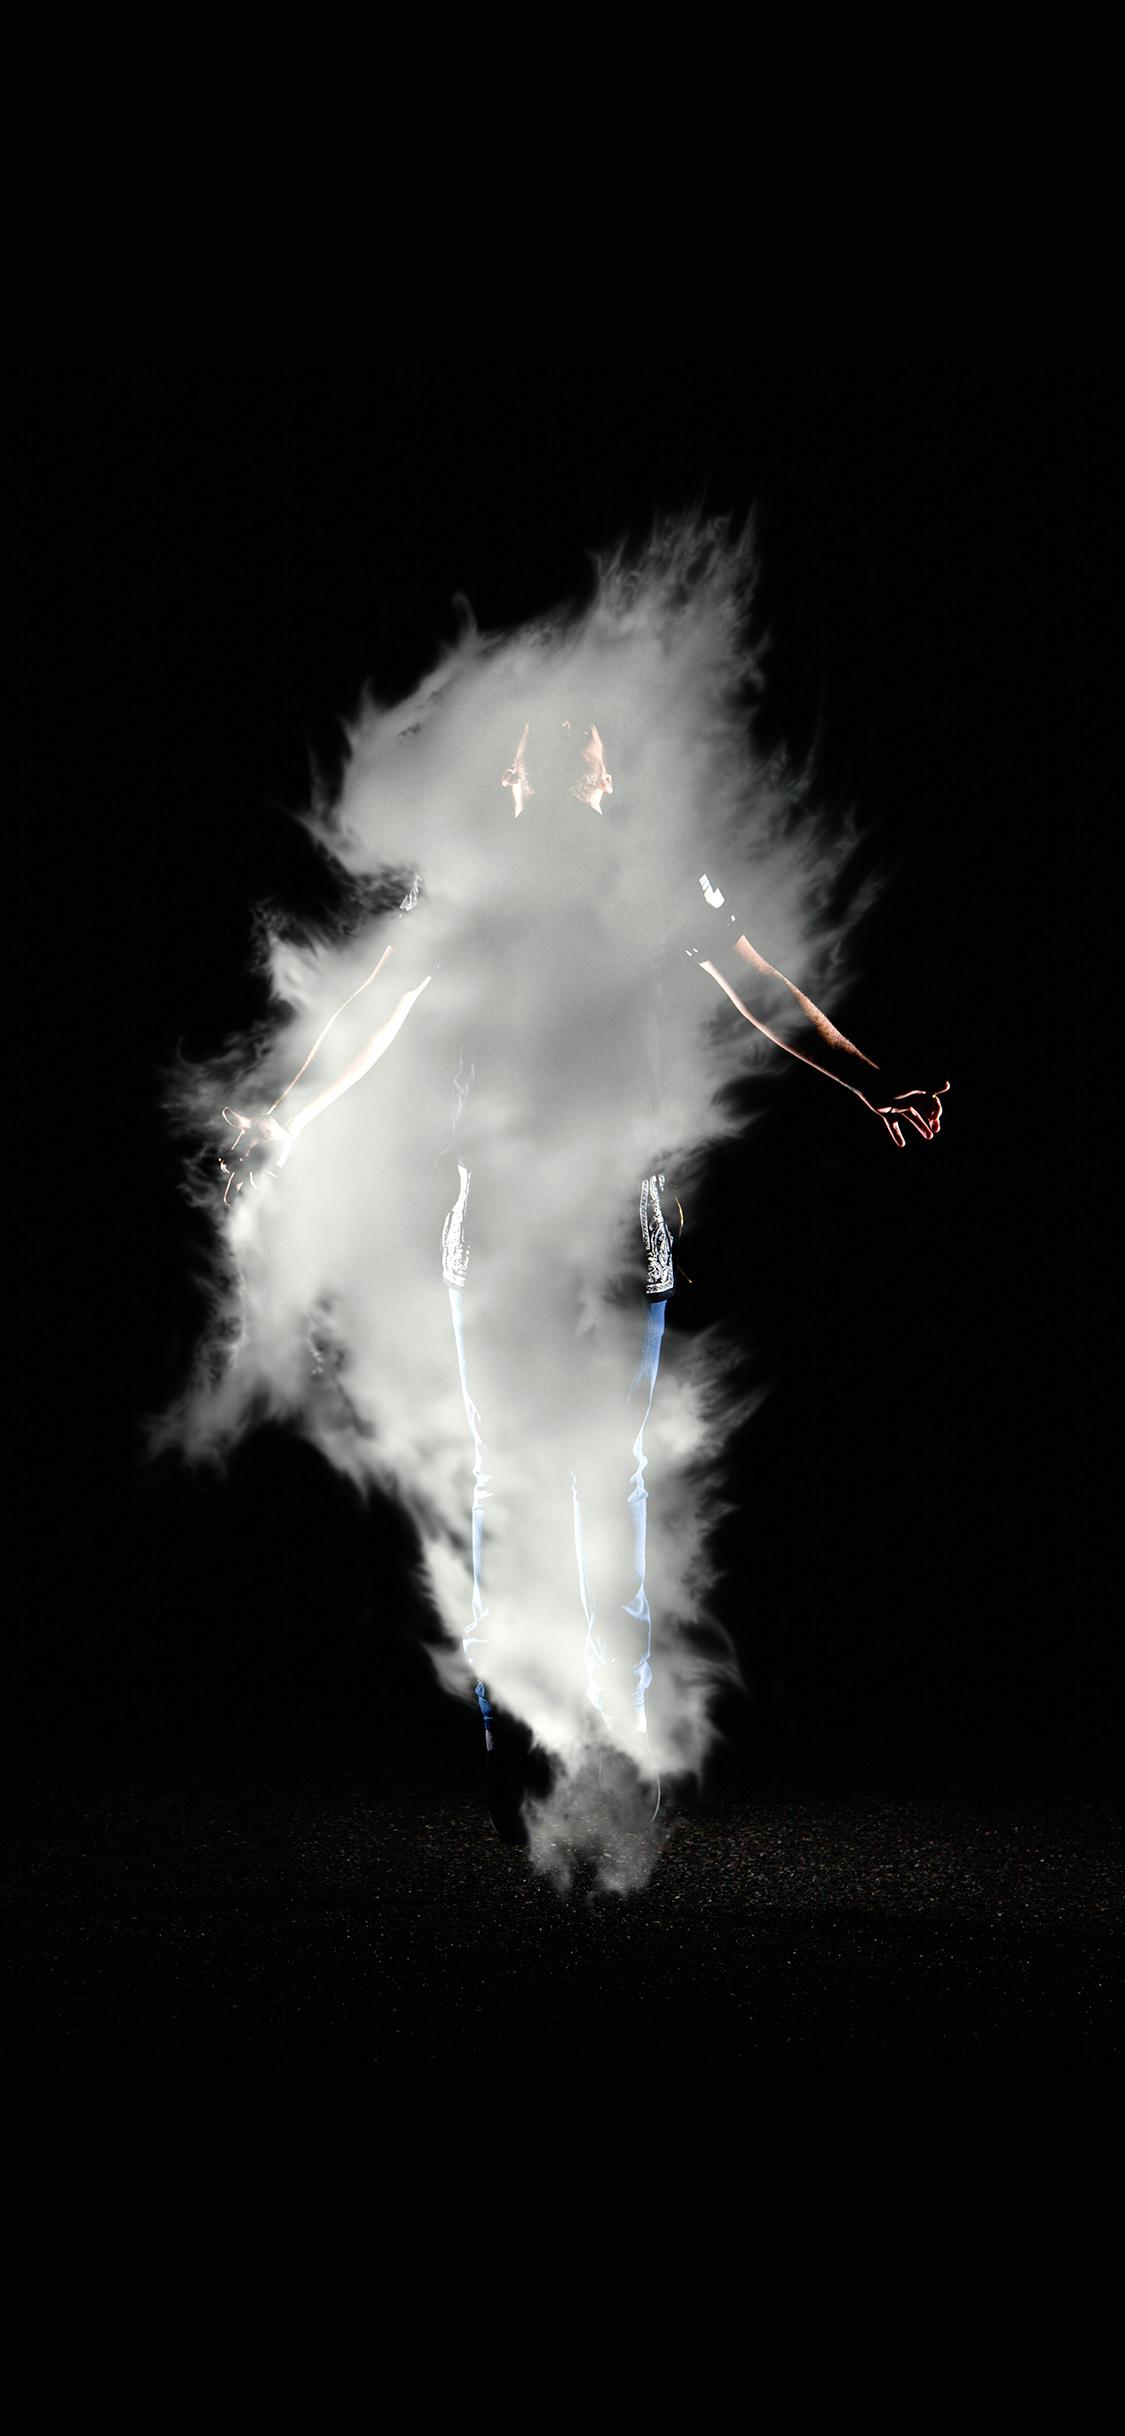 Papers Co Iphone Wallpaper Az49 Man Dark Smoke